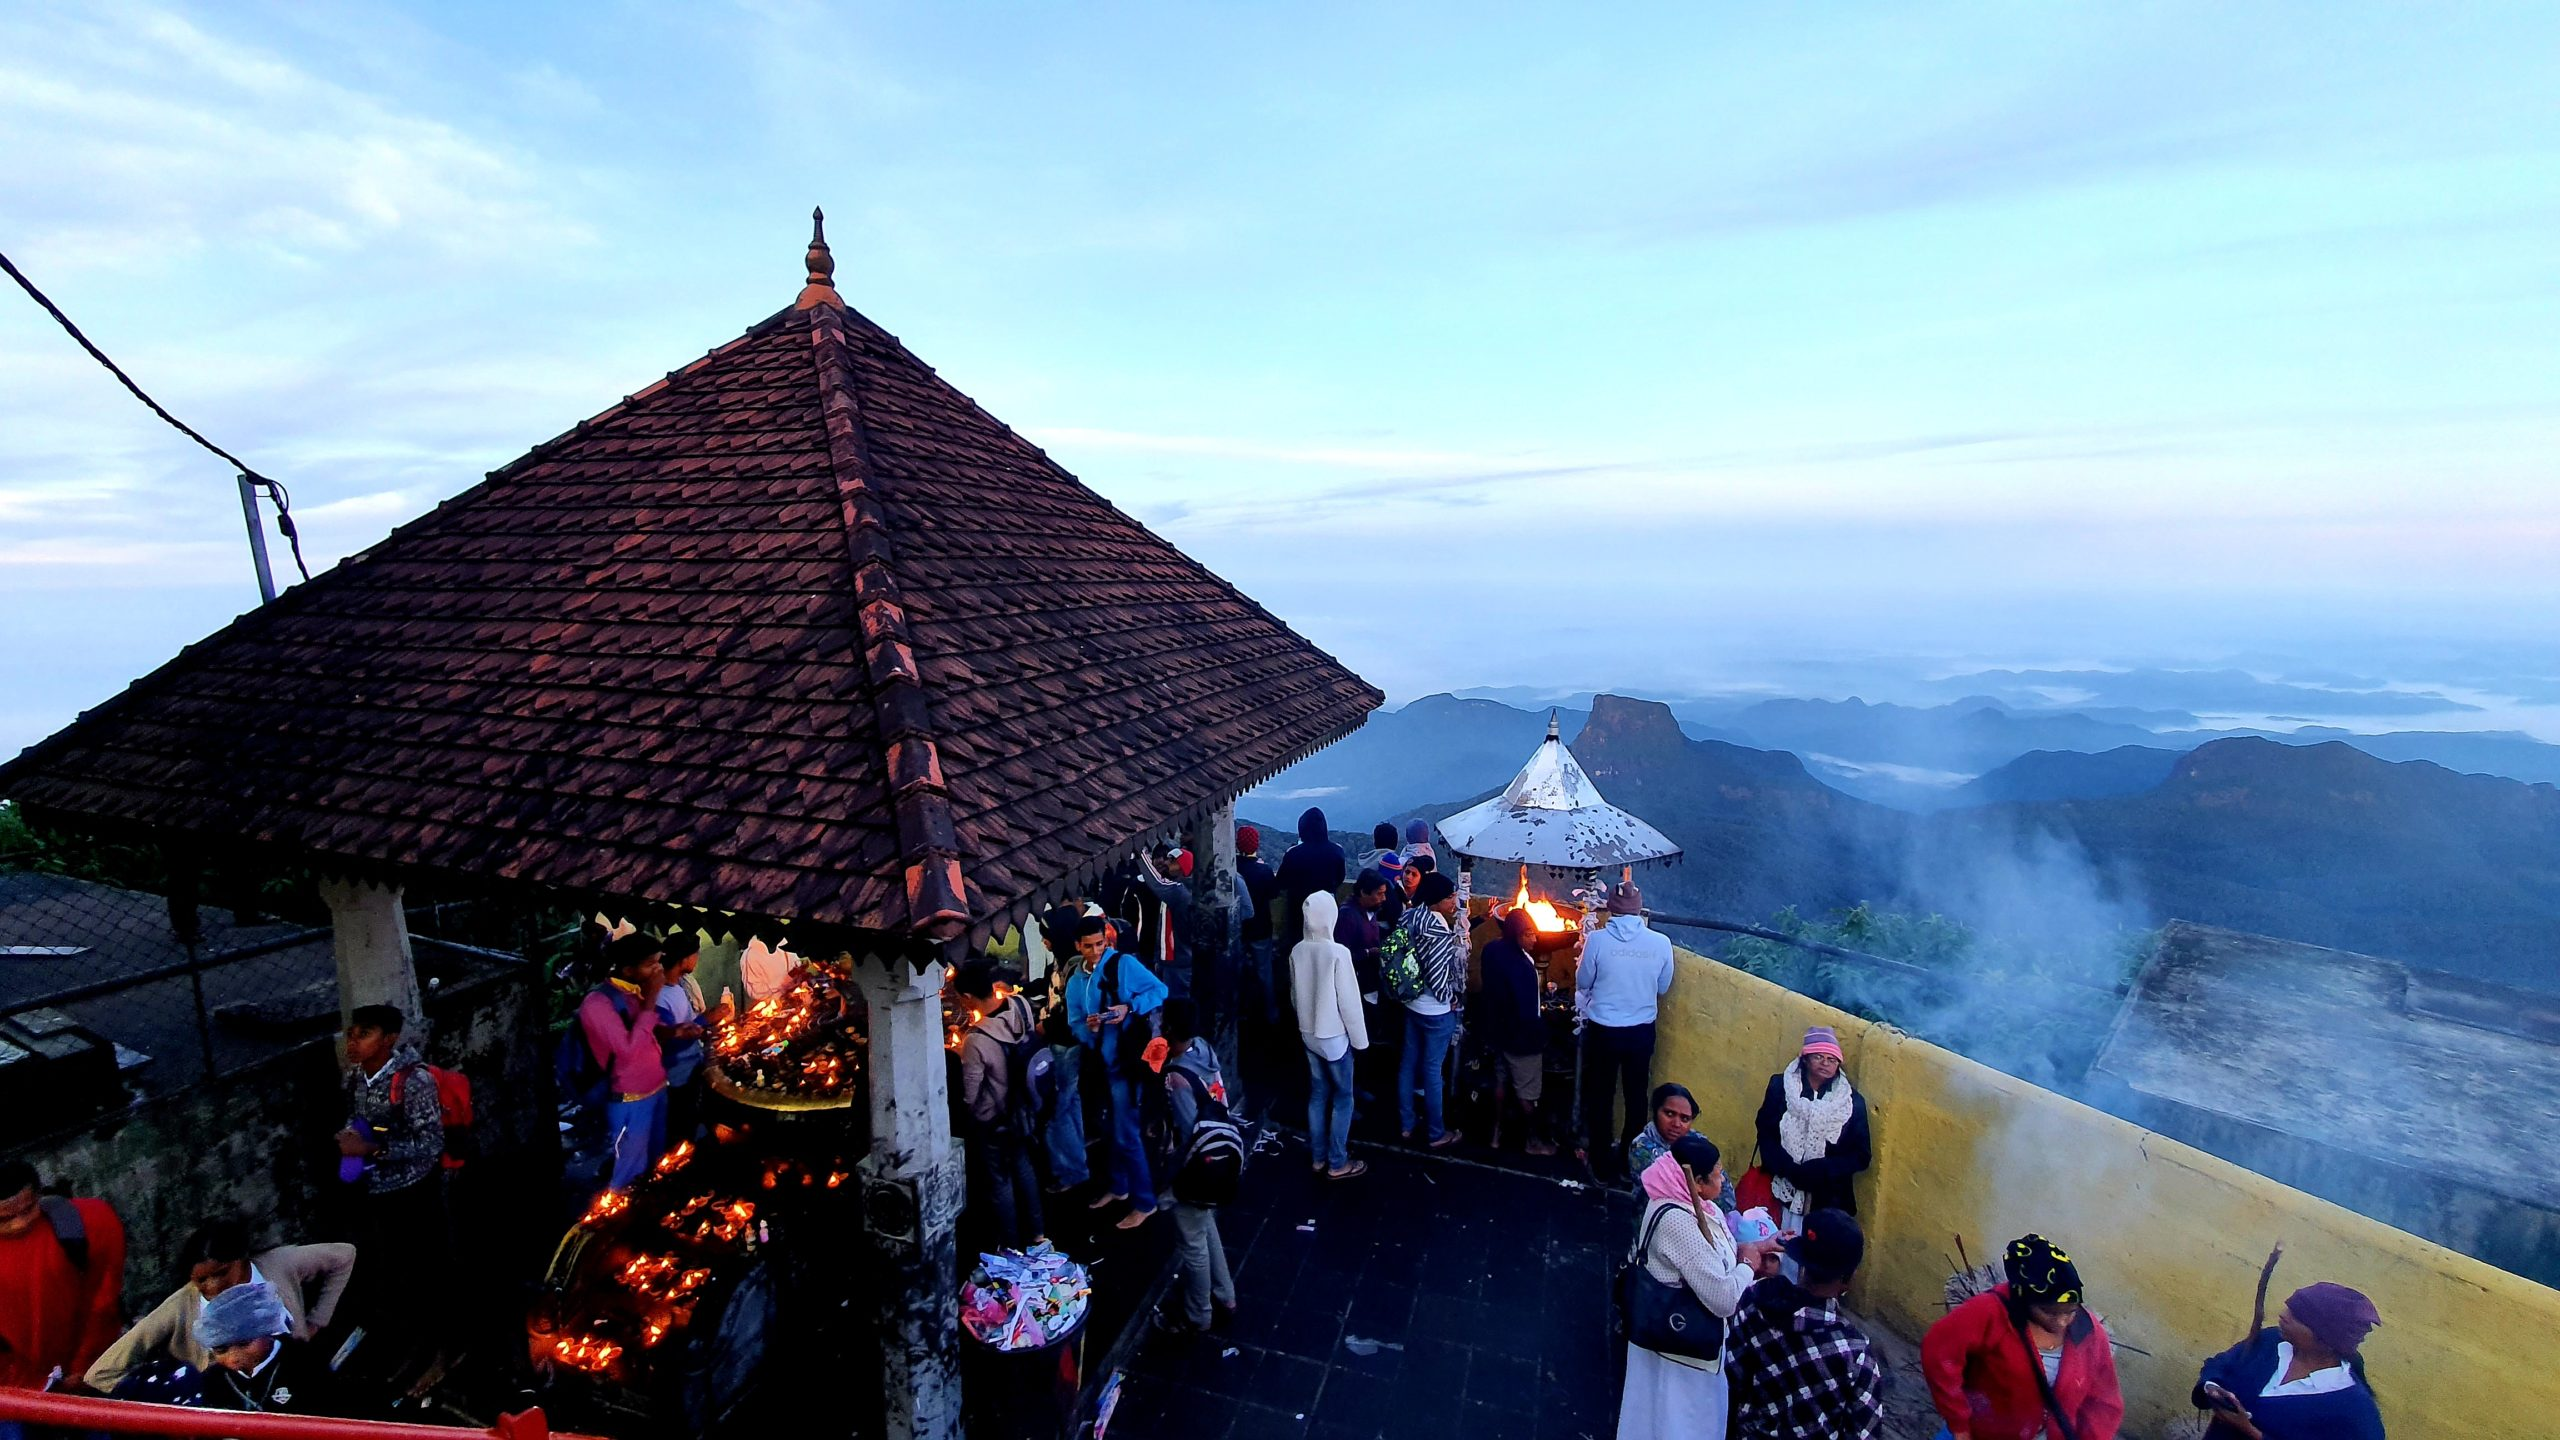 Adam's Peak Sri Lanka worth doing